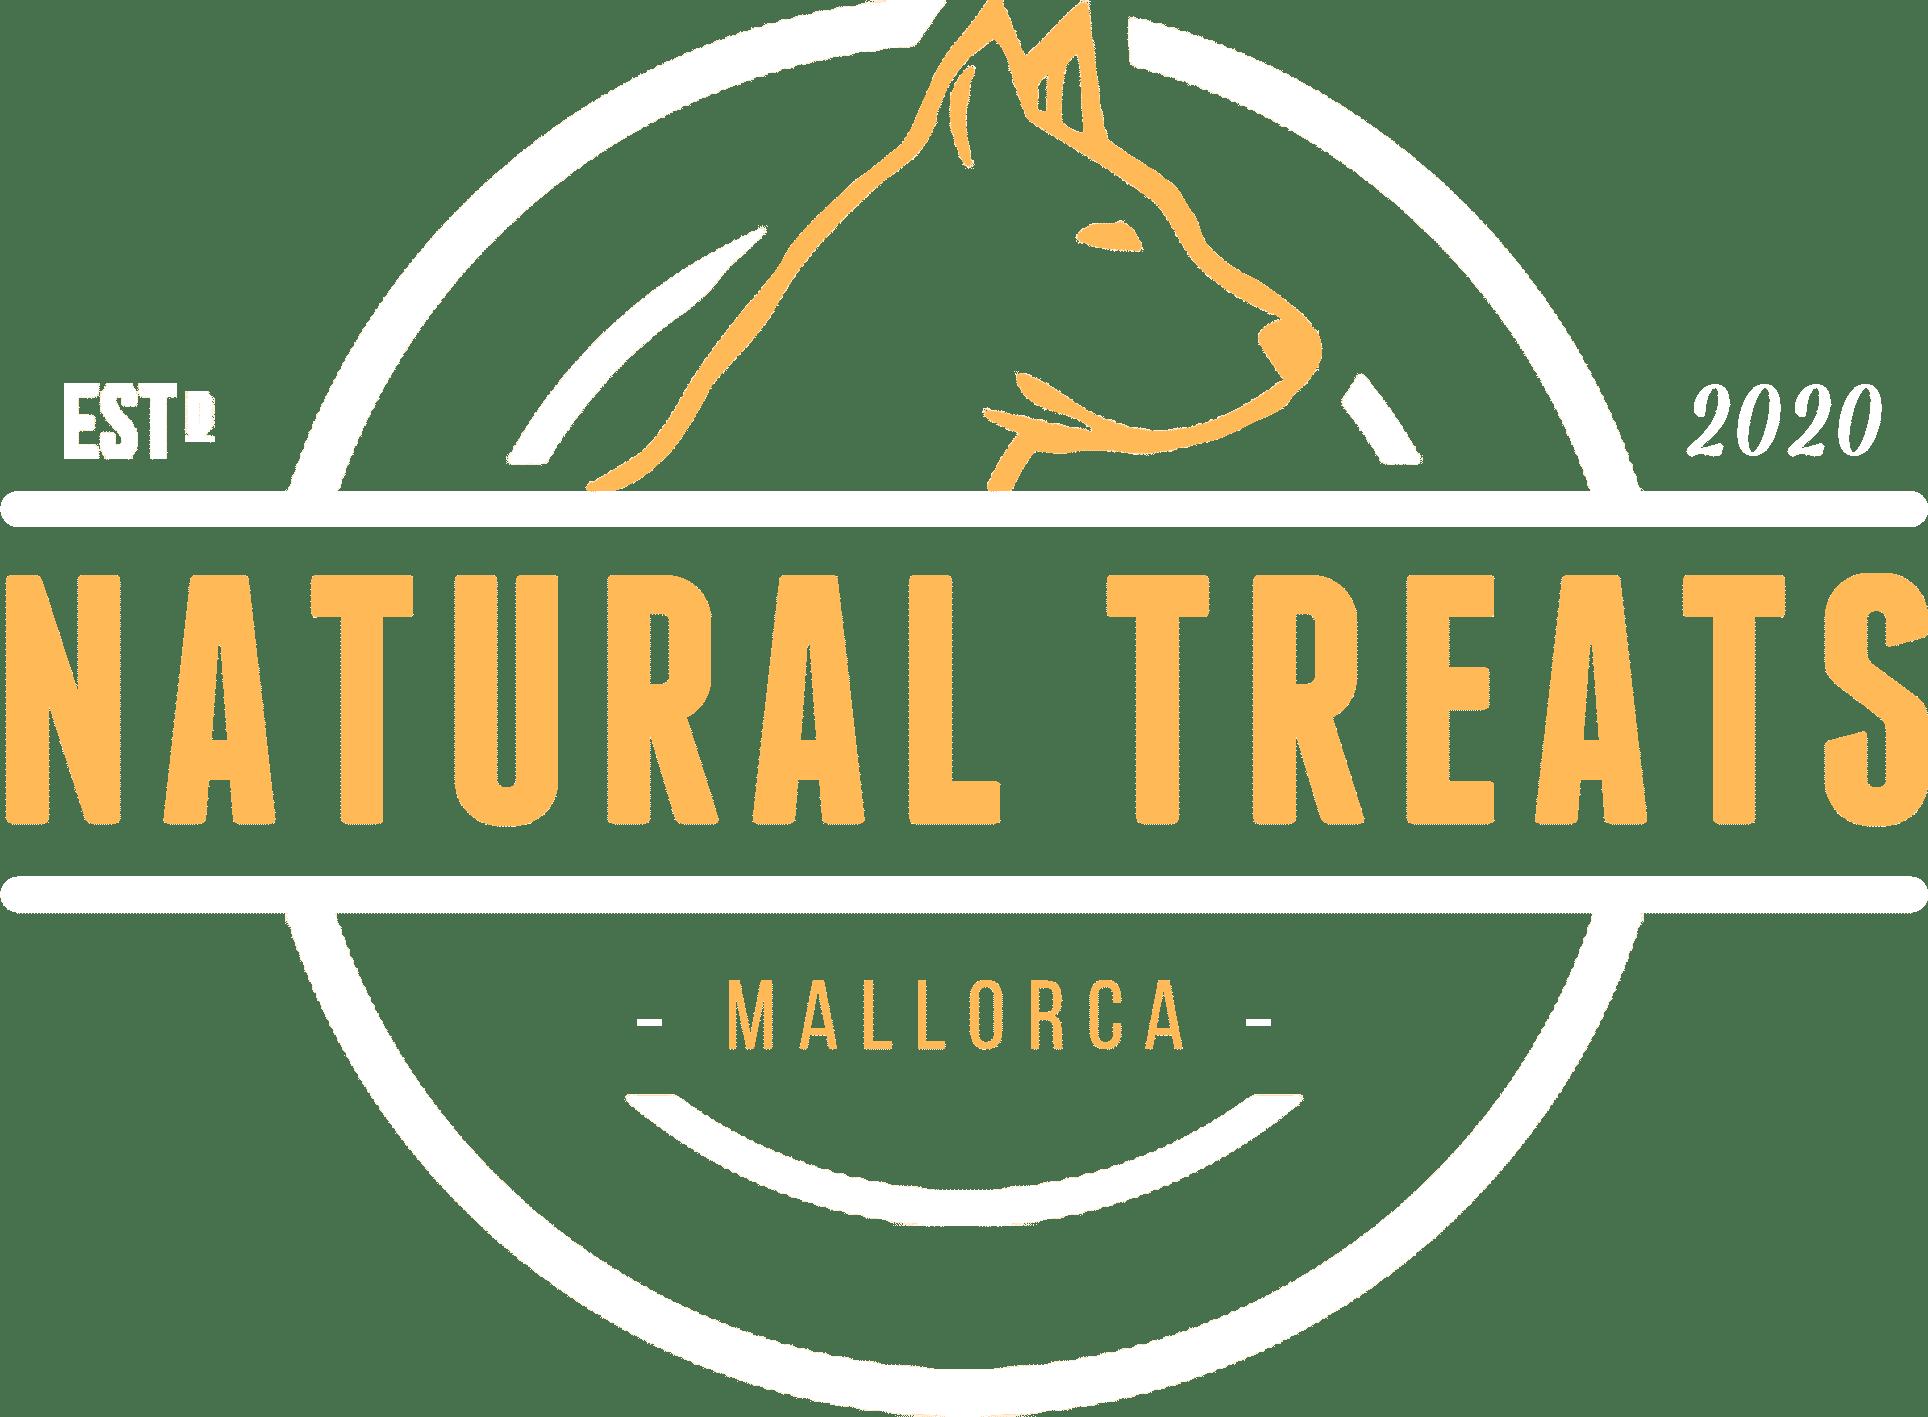 Natural treats mallorca